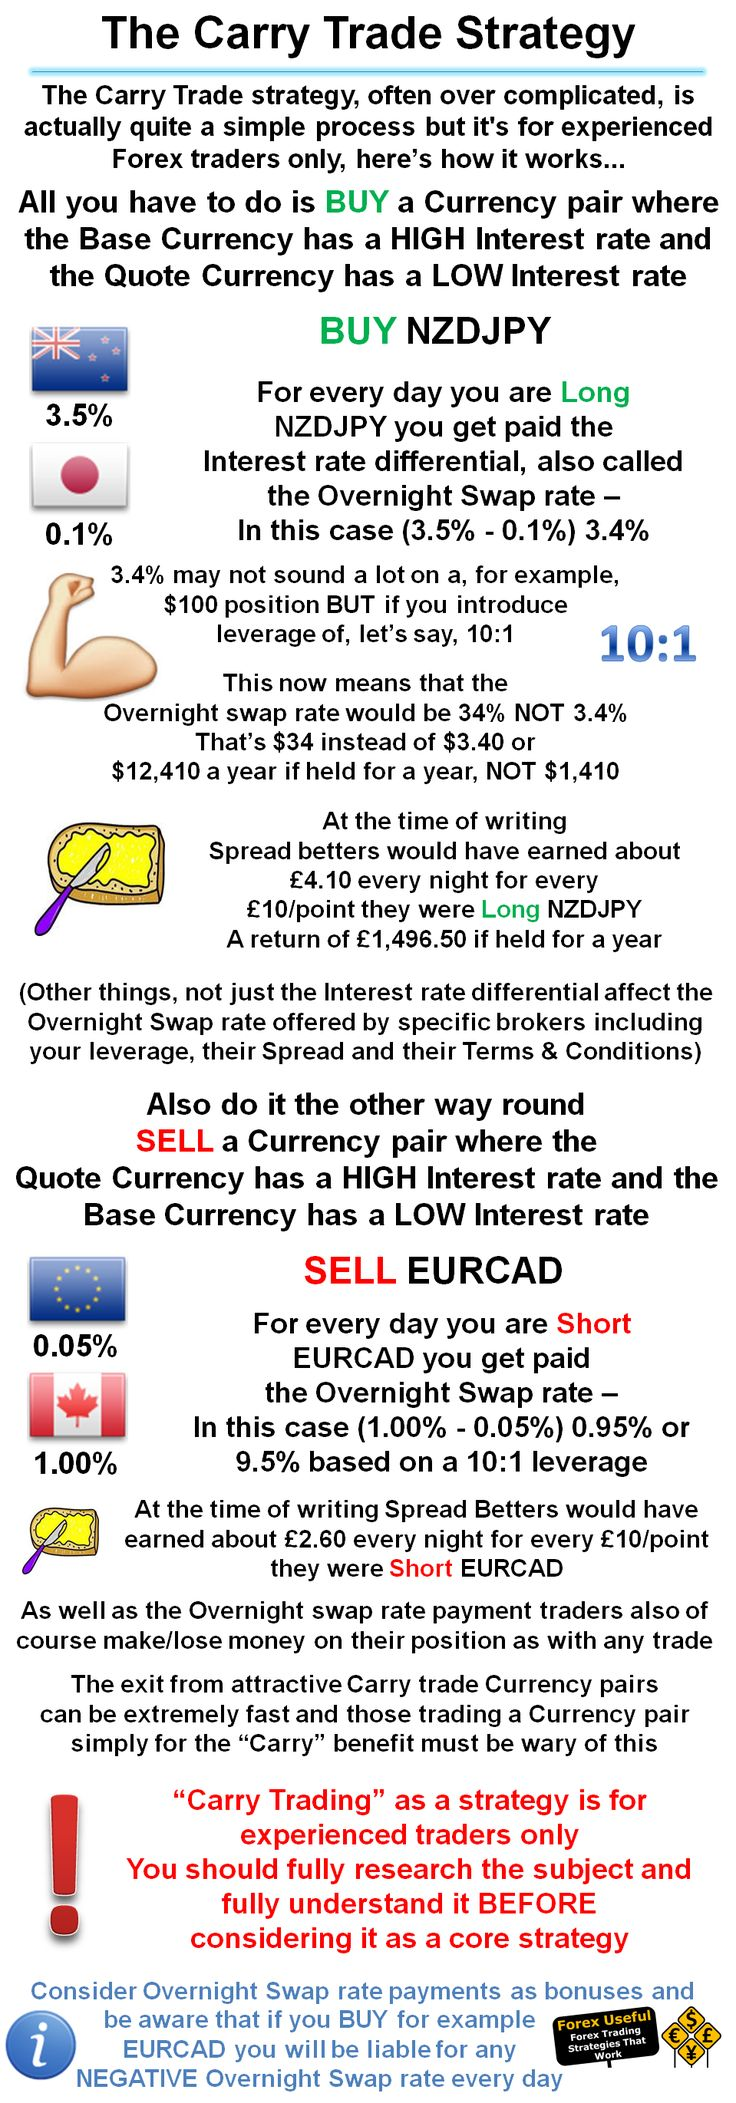 Wwi forex & futures trading forum